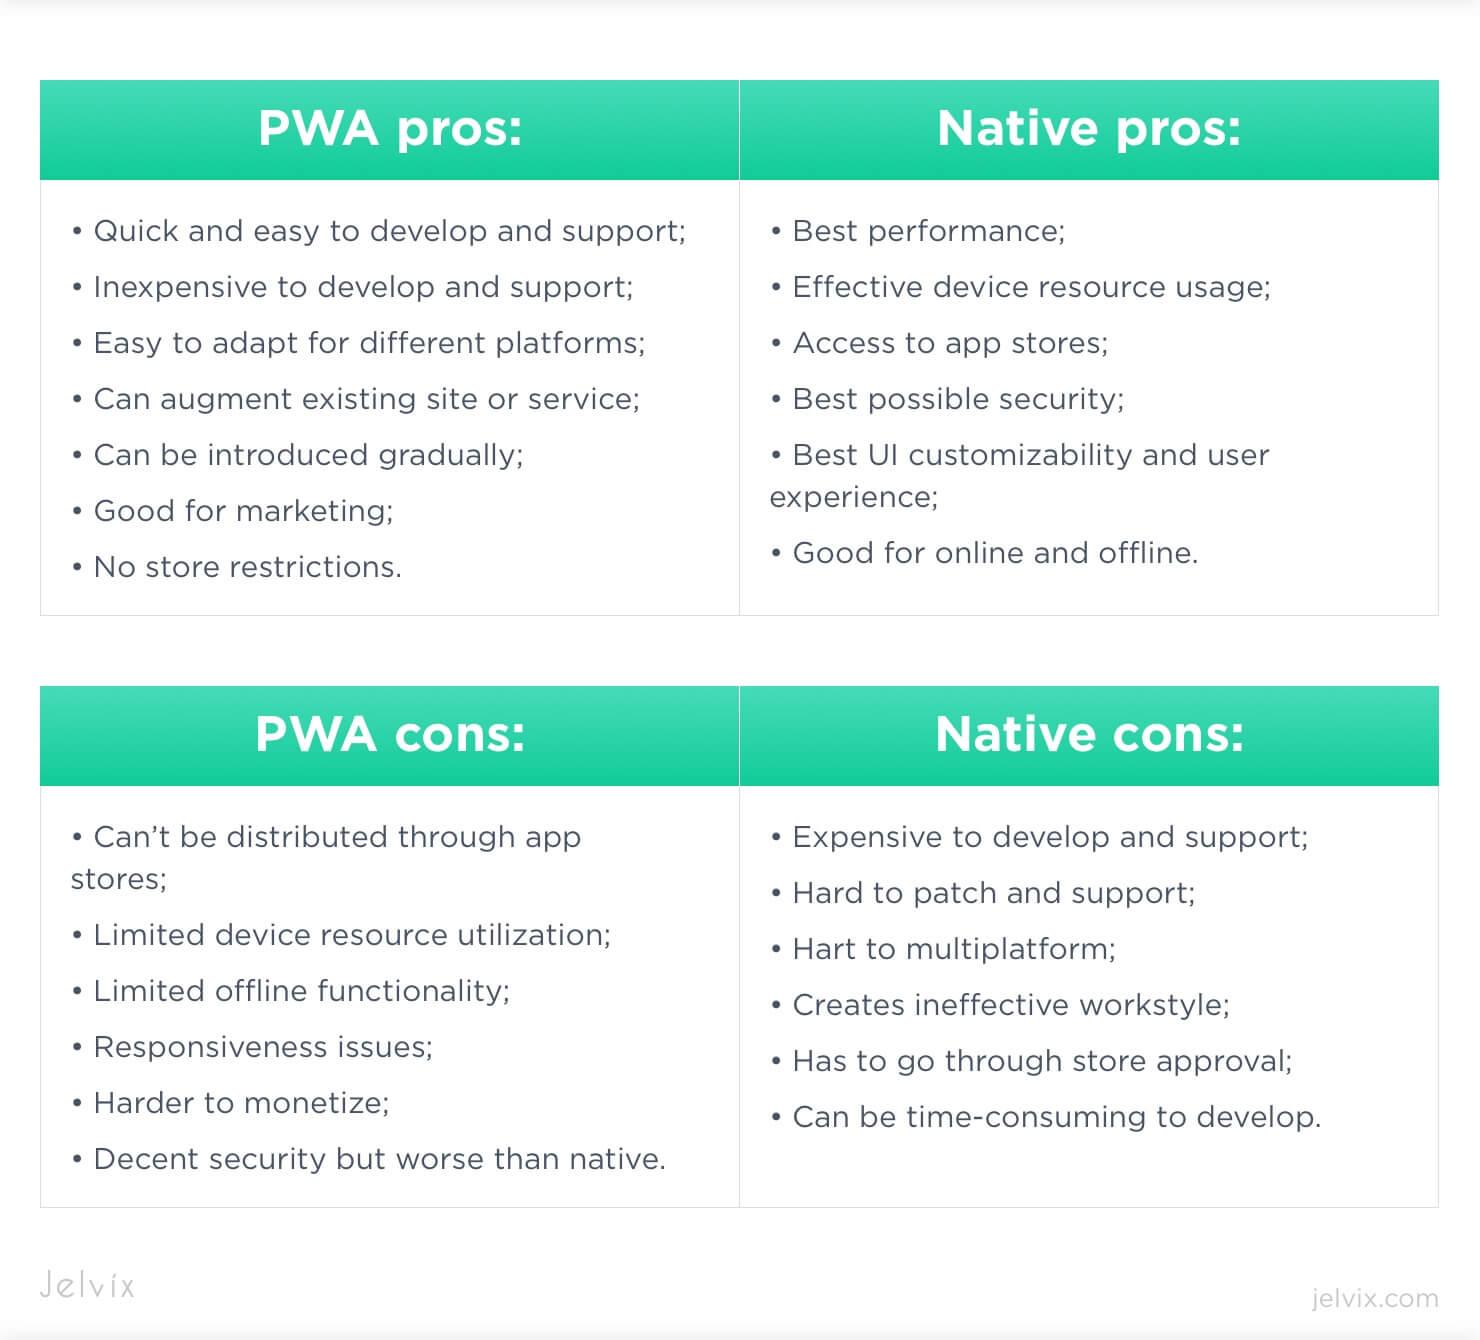 pwa vs native pros and cons